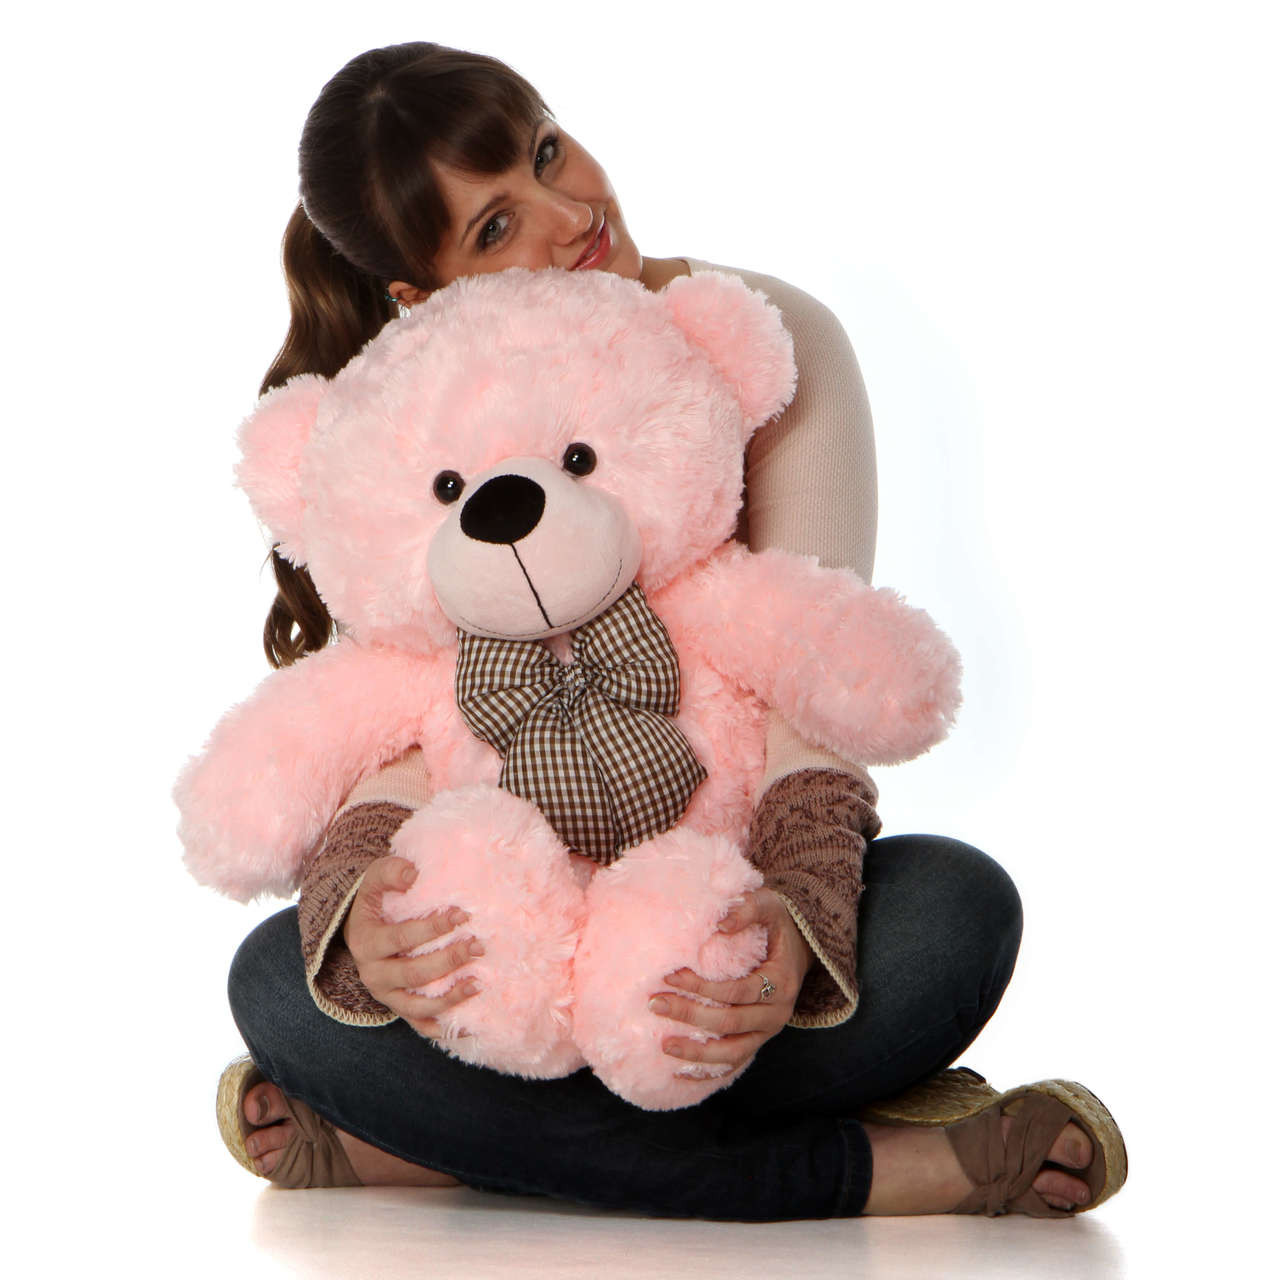 30in Lady Cuddles Super Soft Huggable, Pink Giant Teddy Plush Bear